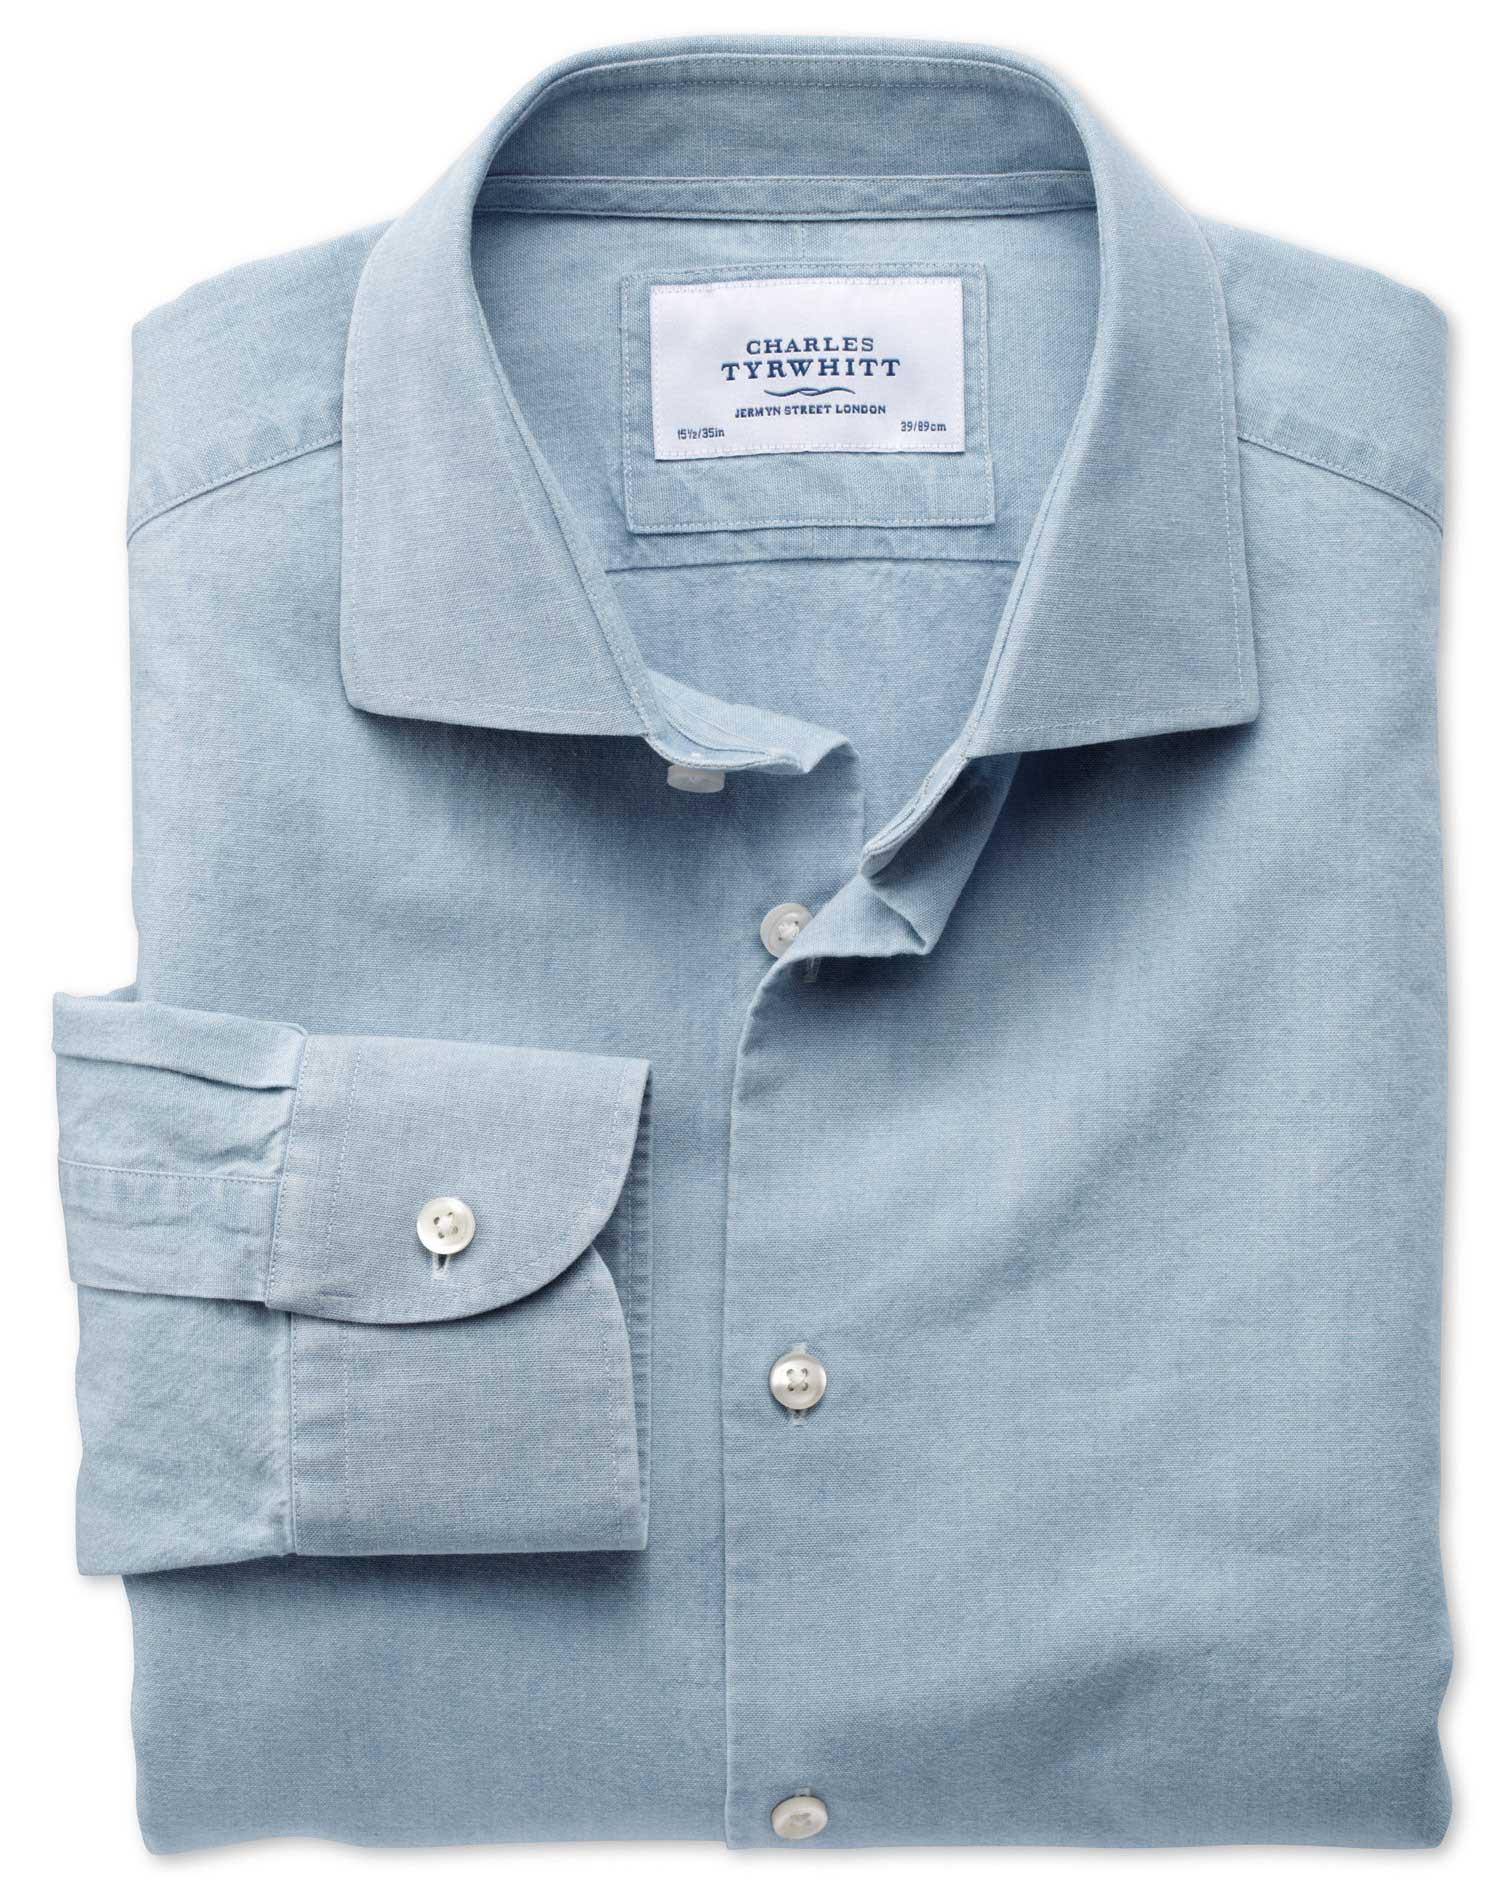 Extra Slim Fit Semi-Cutaway Collar Business Casual Chambray Denim Blue Cotton Formal Shirt Single Cu